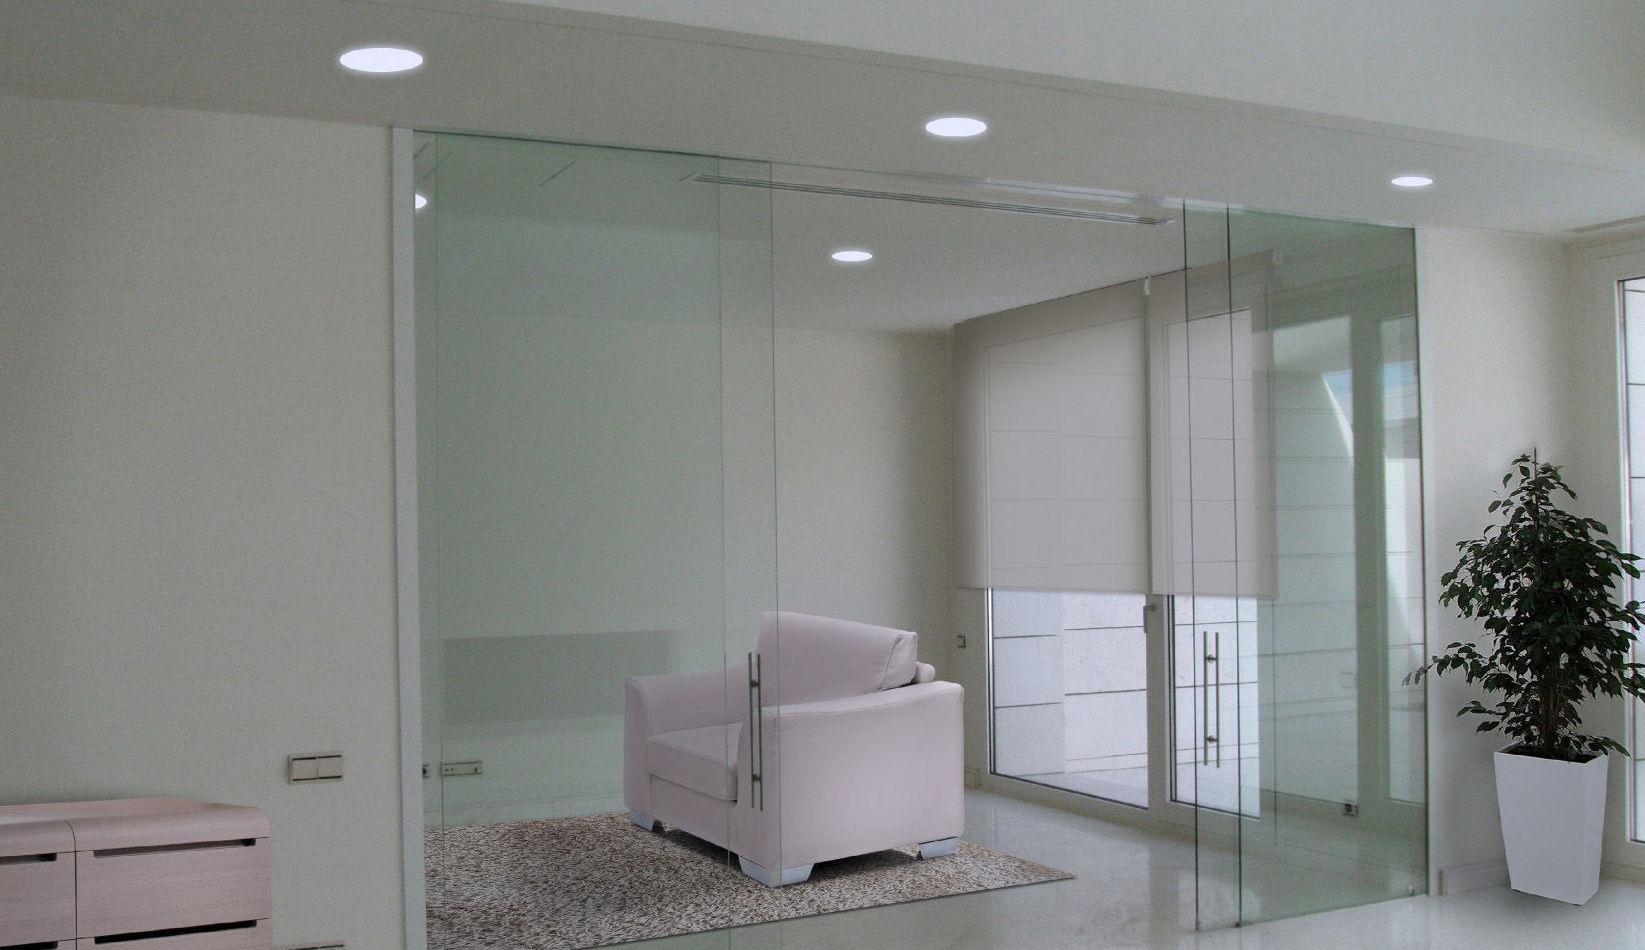 Dos puertas de cristal para separar espacios